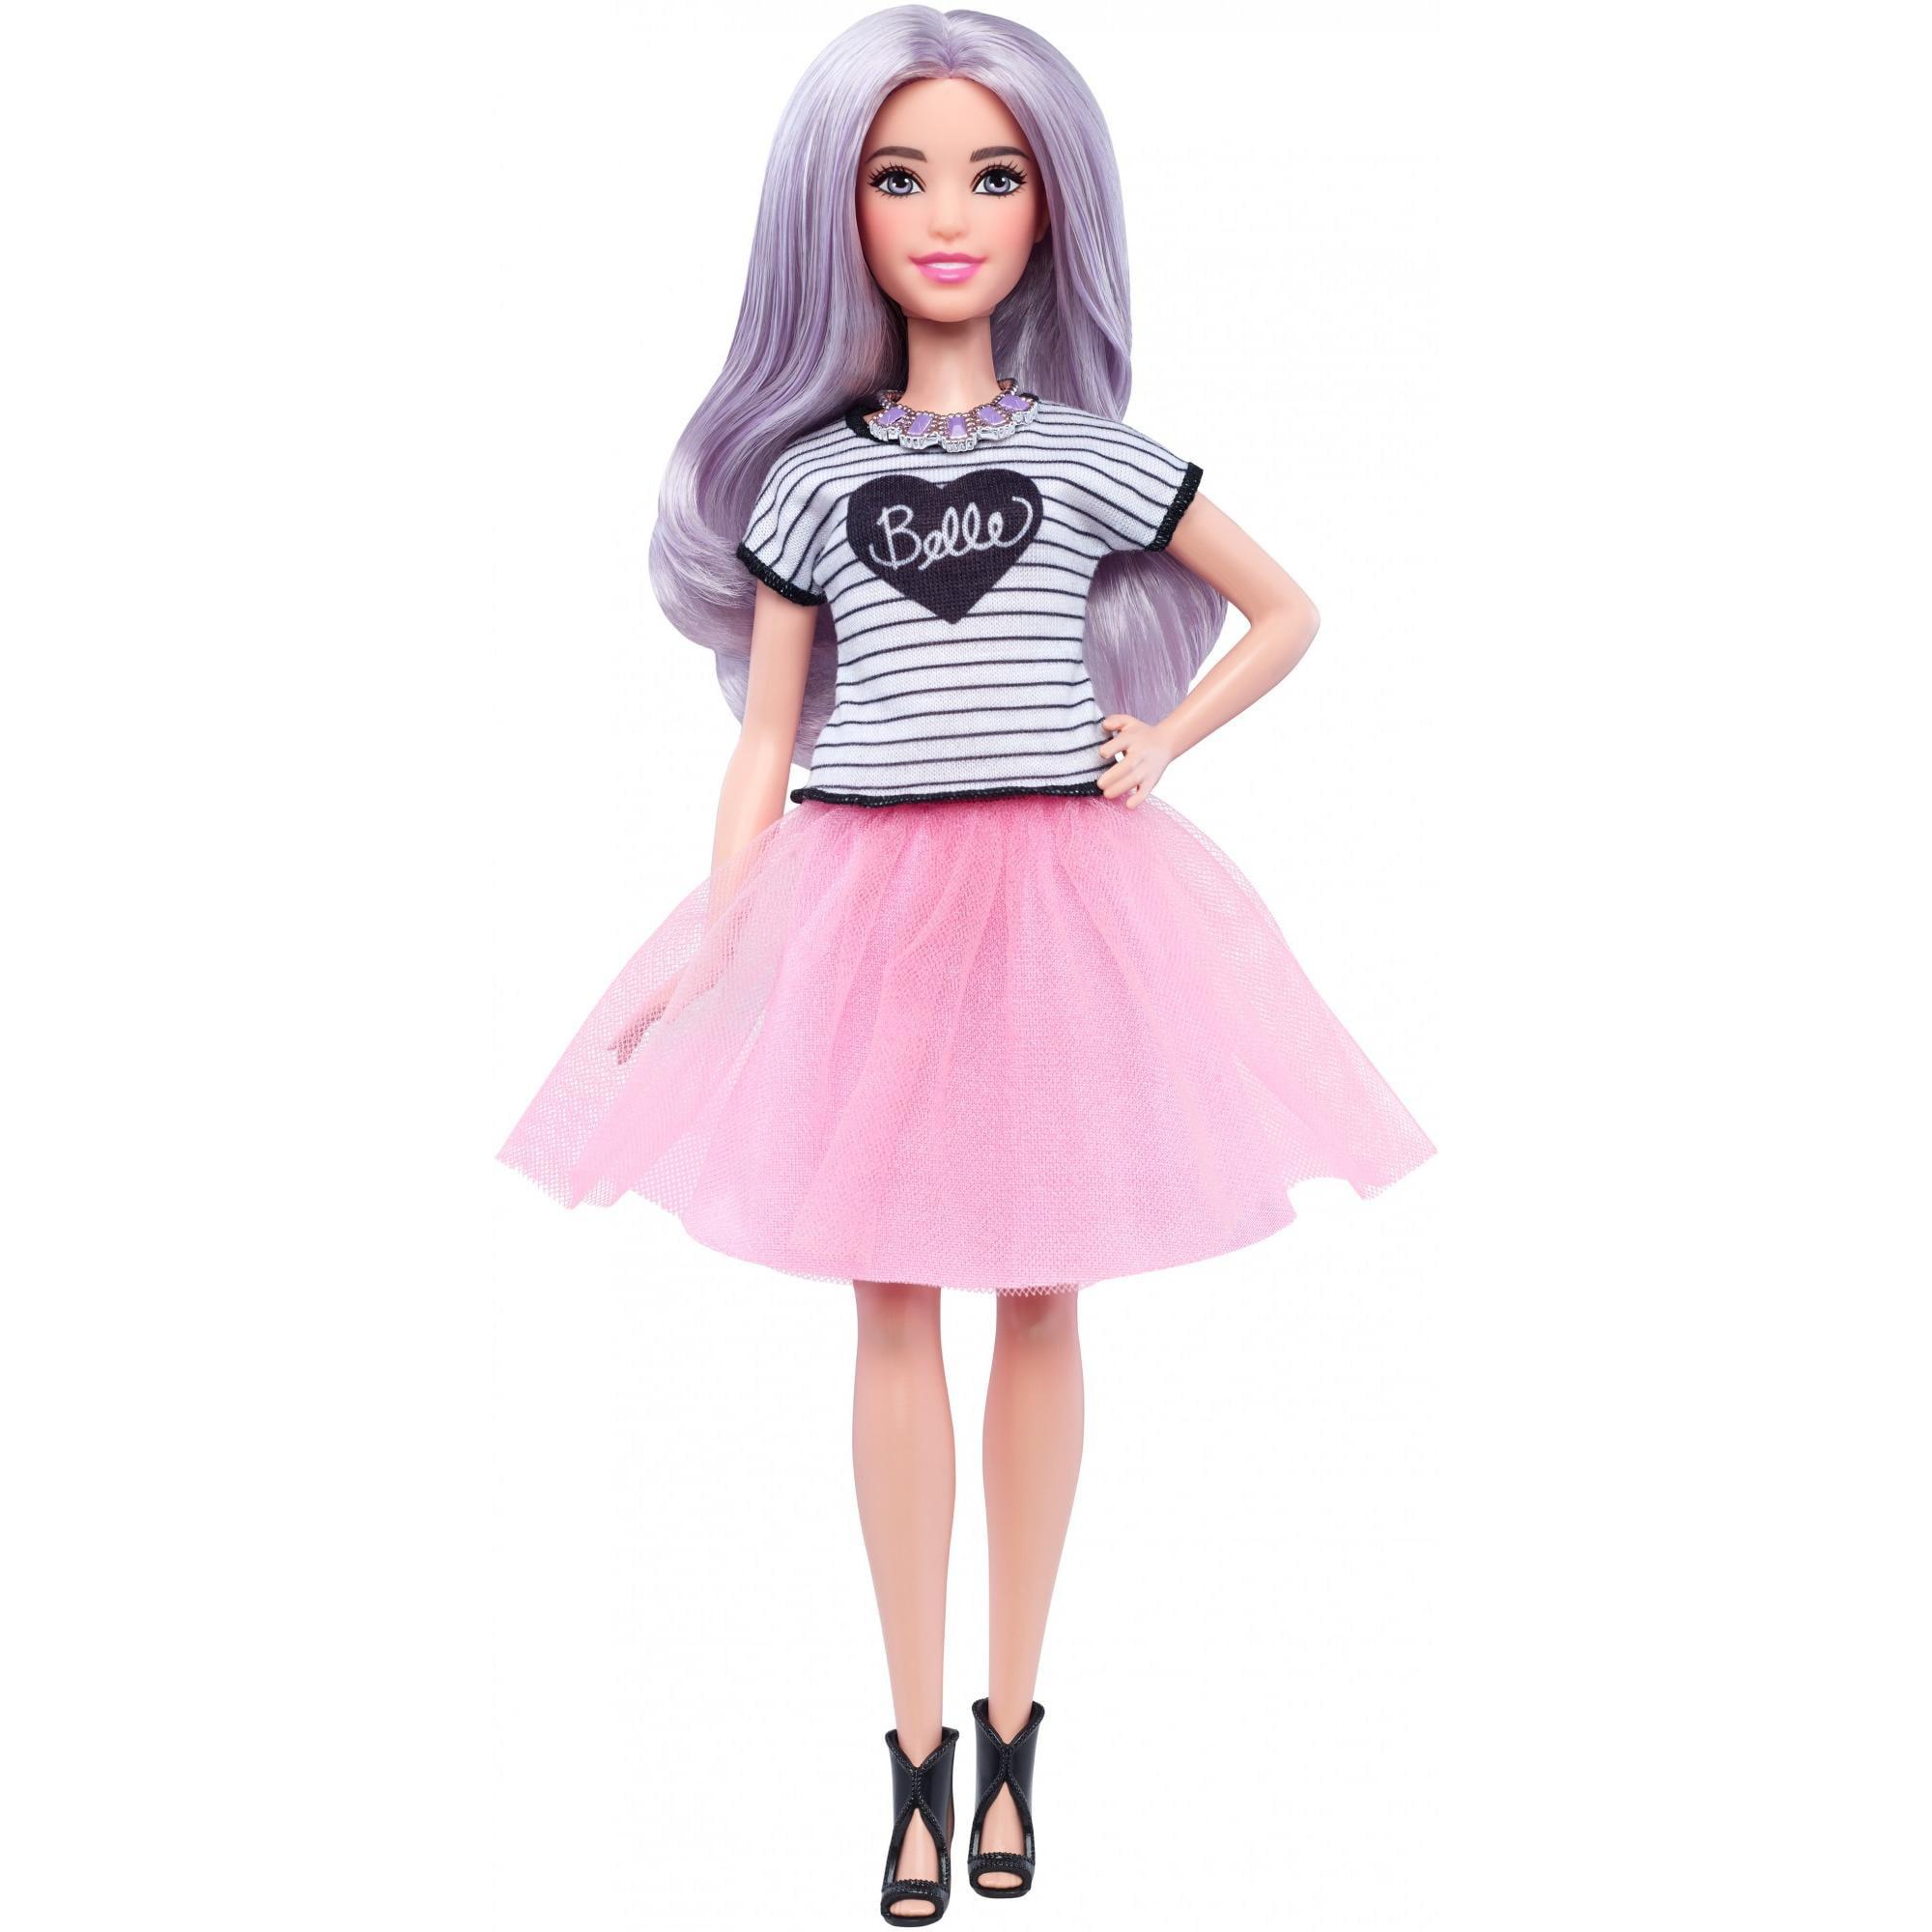 Barbie Fashionistas Tutu Cool, Petite Body Doll by MATTEL INC.